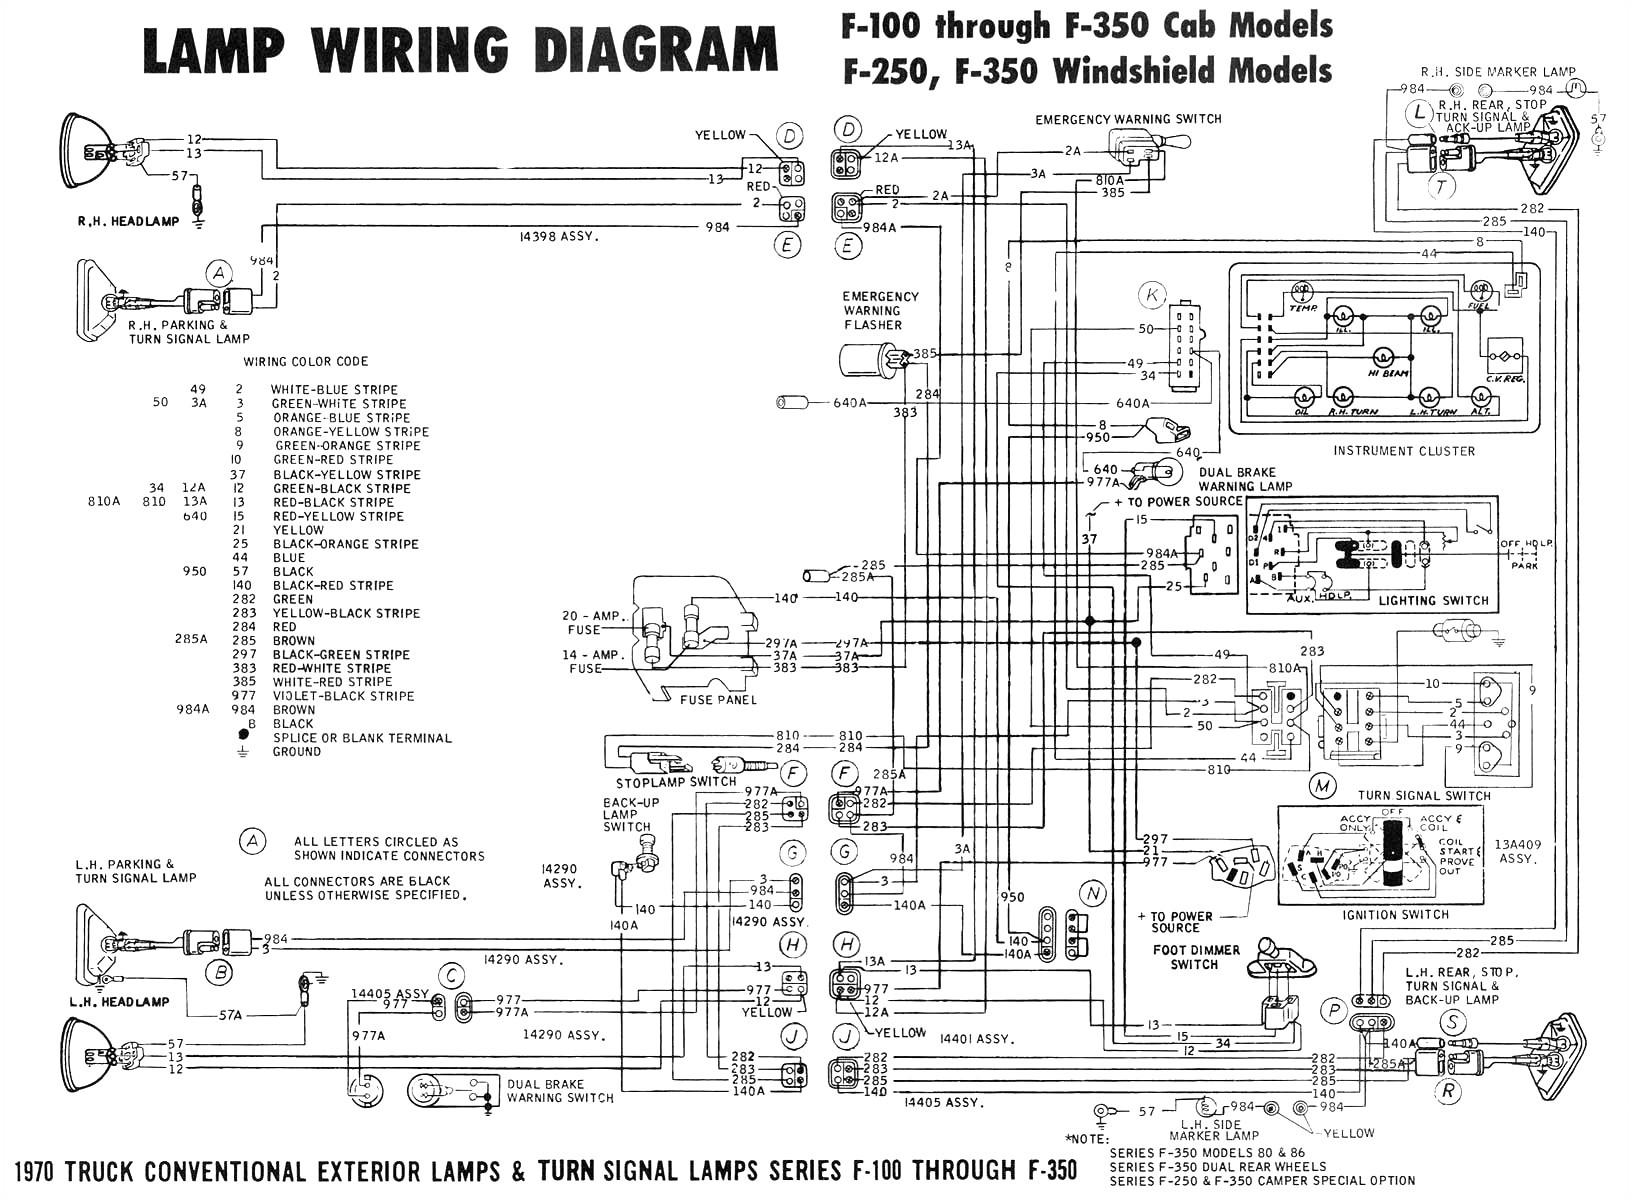 57 chevy steering column diagram spark plugs location diagram 2006 chevy steering column diagram spark plugs location diagram 2006 ford